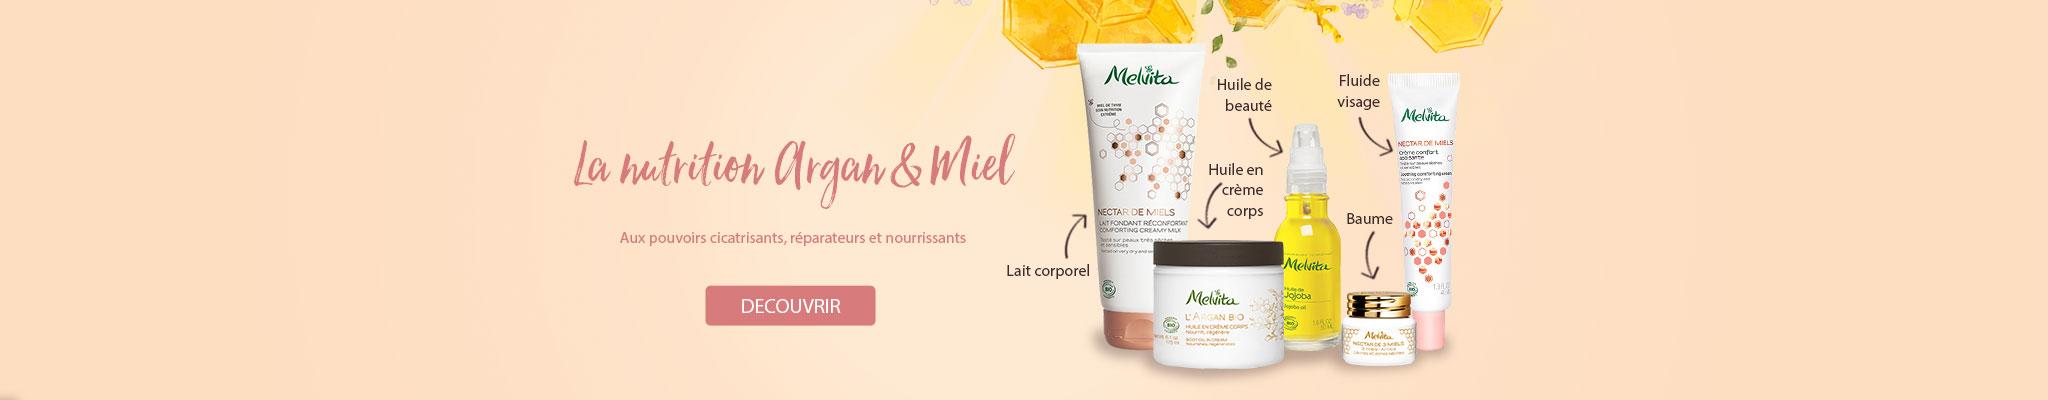 nutrition nectar de miels